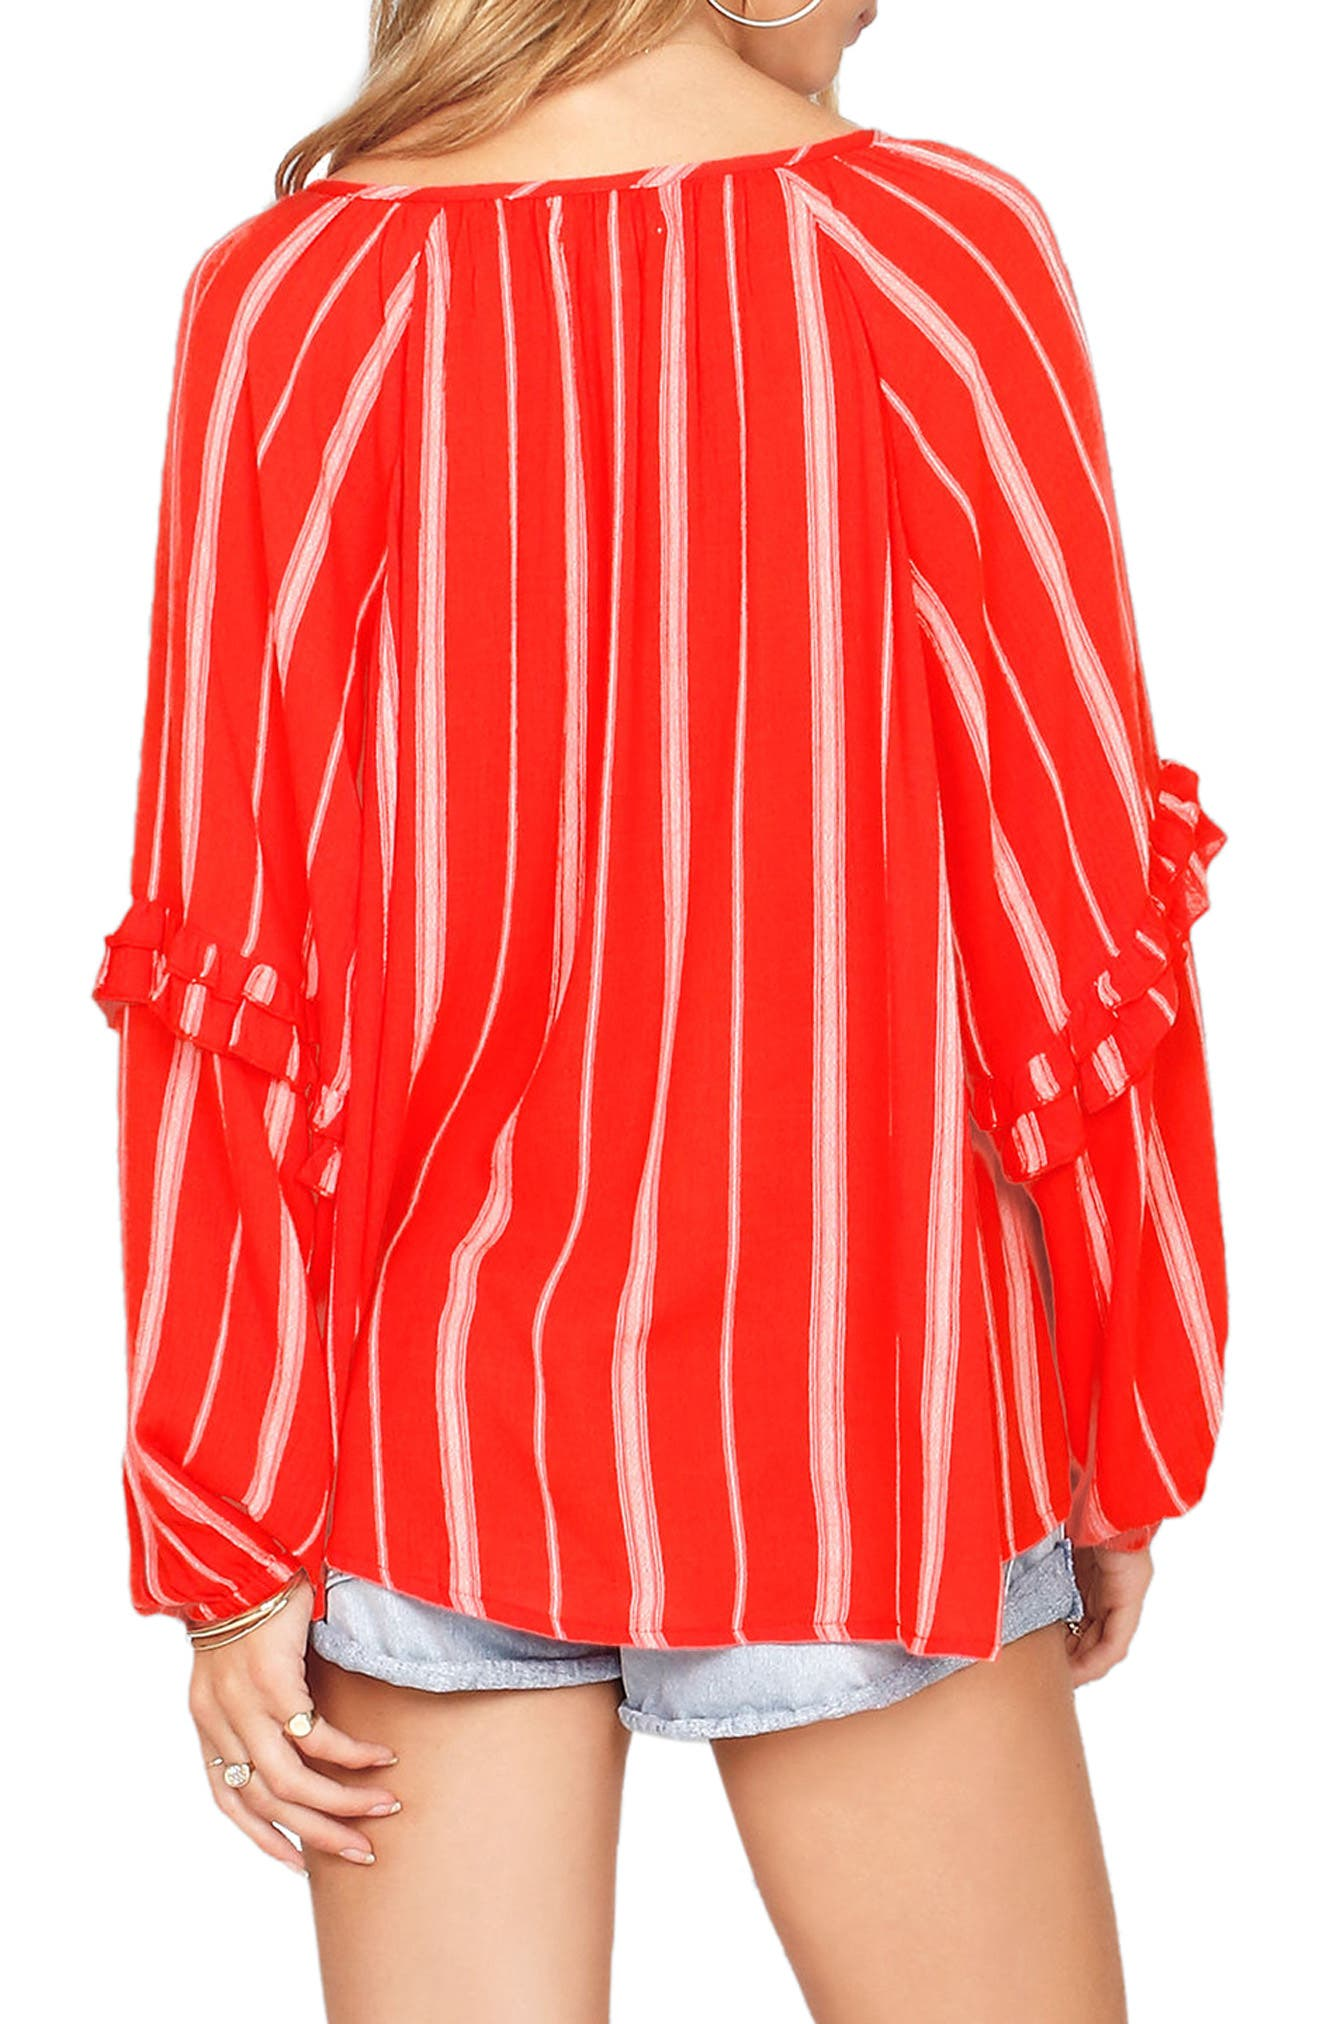 Solare Stripe Top,                             Alternate thumbnail 2, color,                             Rebel Red